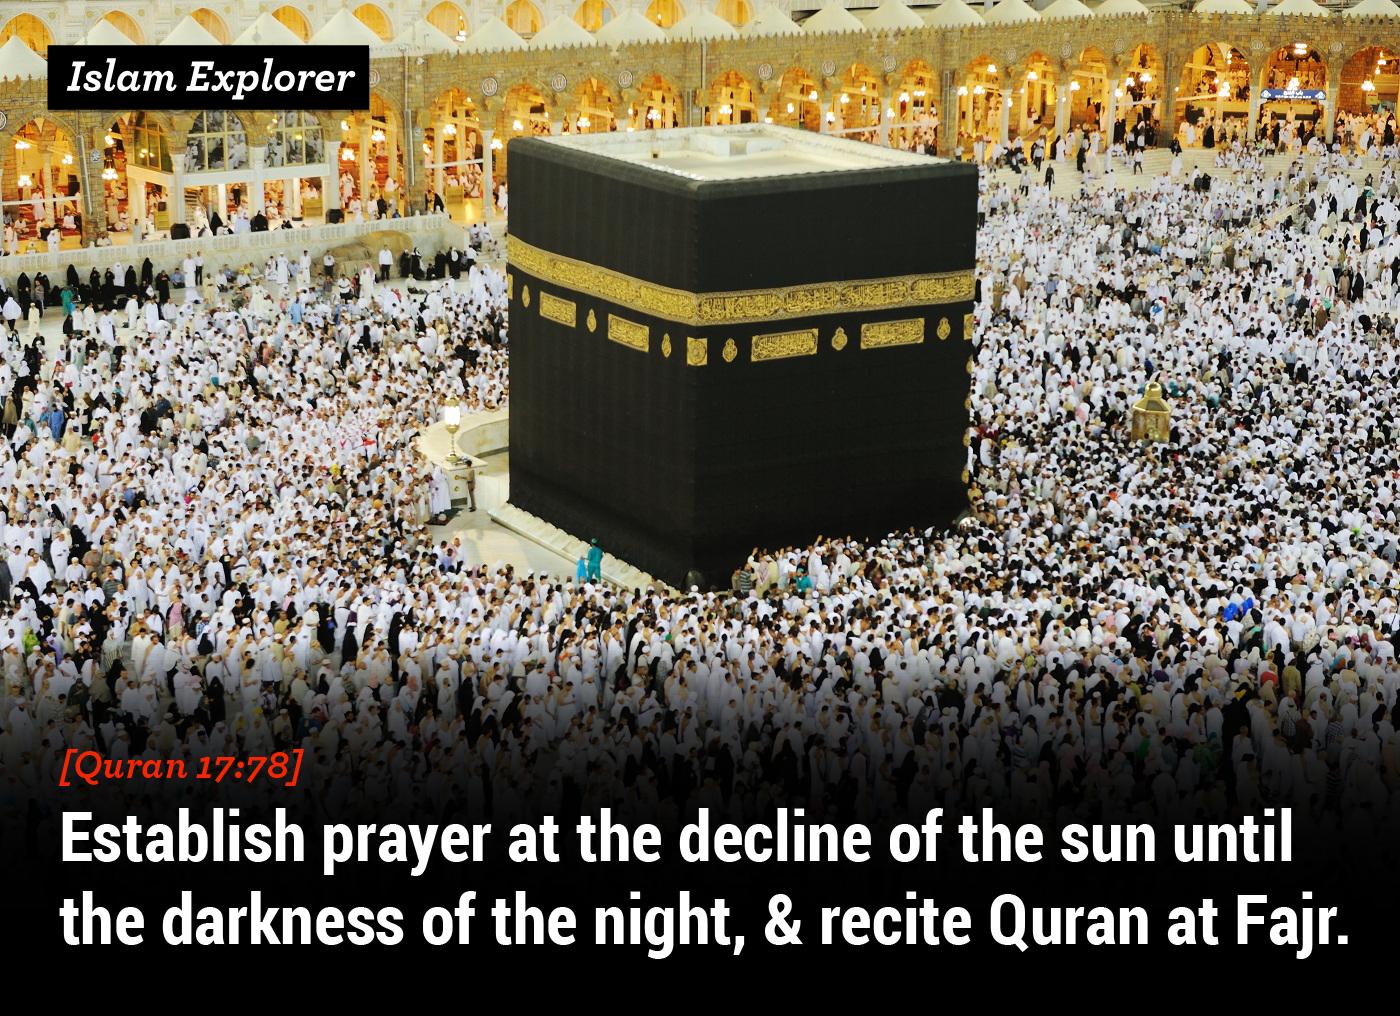 Establish prayer at the decline of the sun